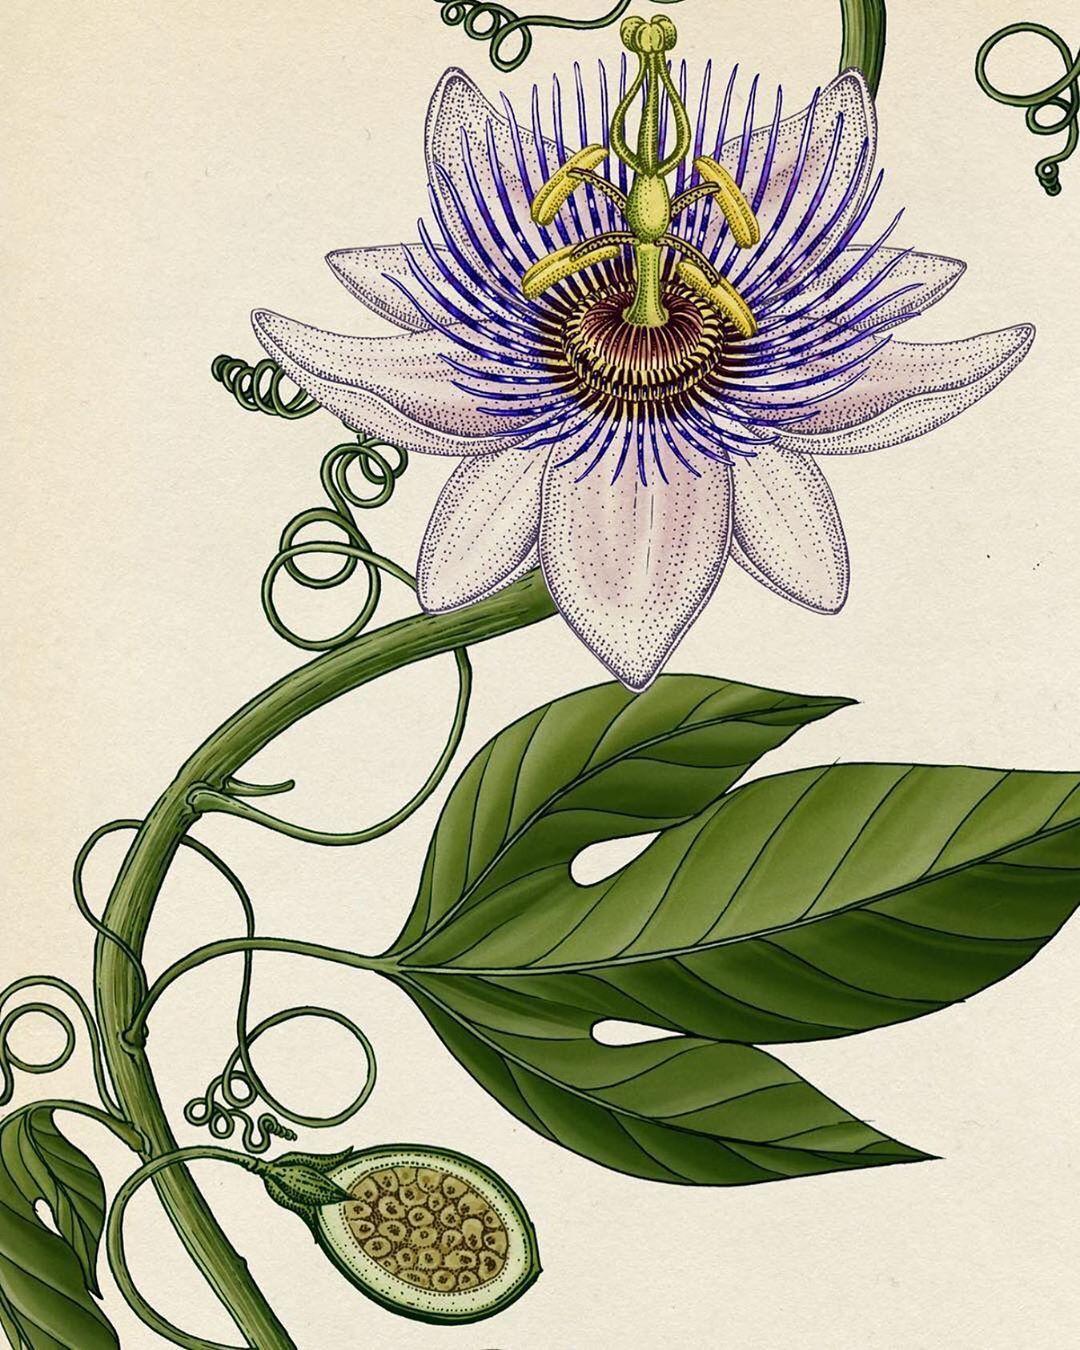 Monique V D Vlist Artdirector En Instagram Today Blooming In My Insta Garden Passiflora Illustration In 2020 Plant Illustration Flower Vine Tattoos Flower Art